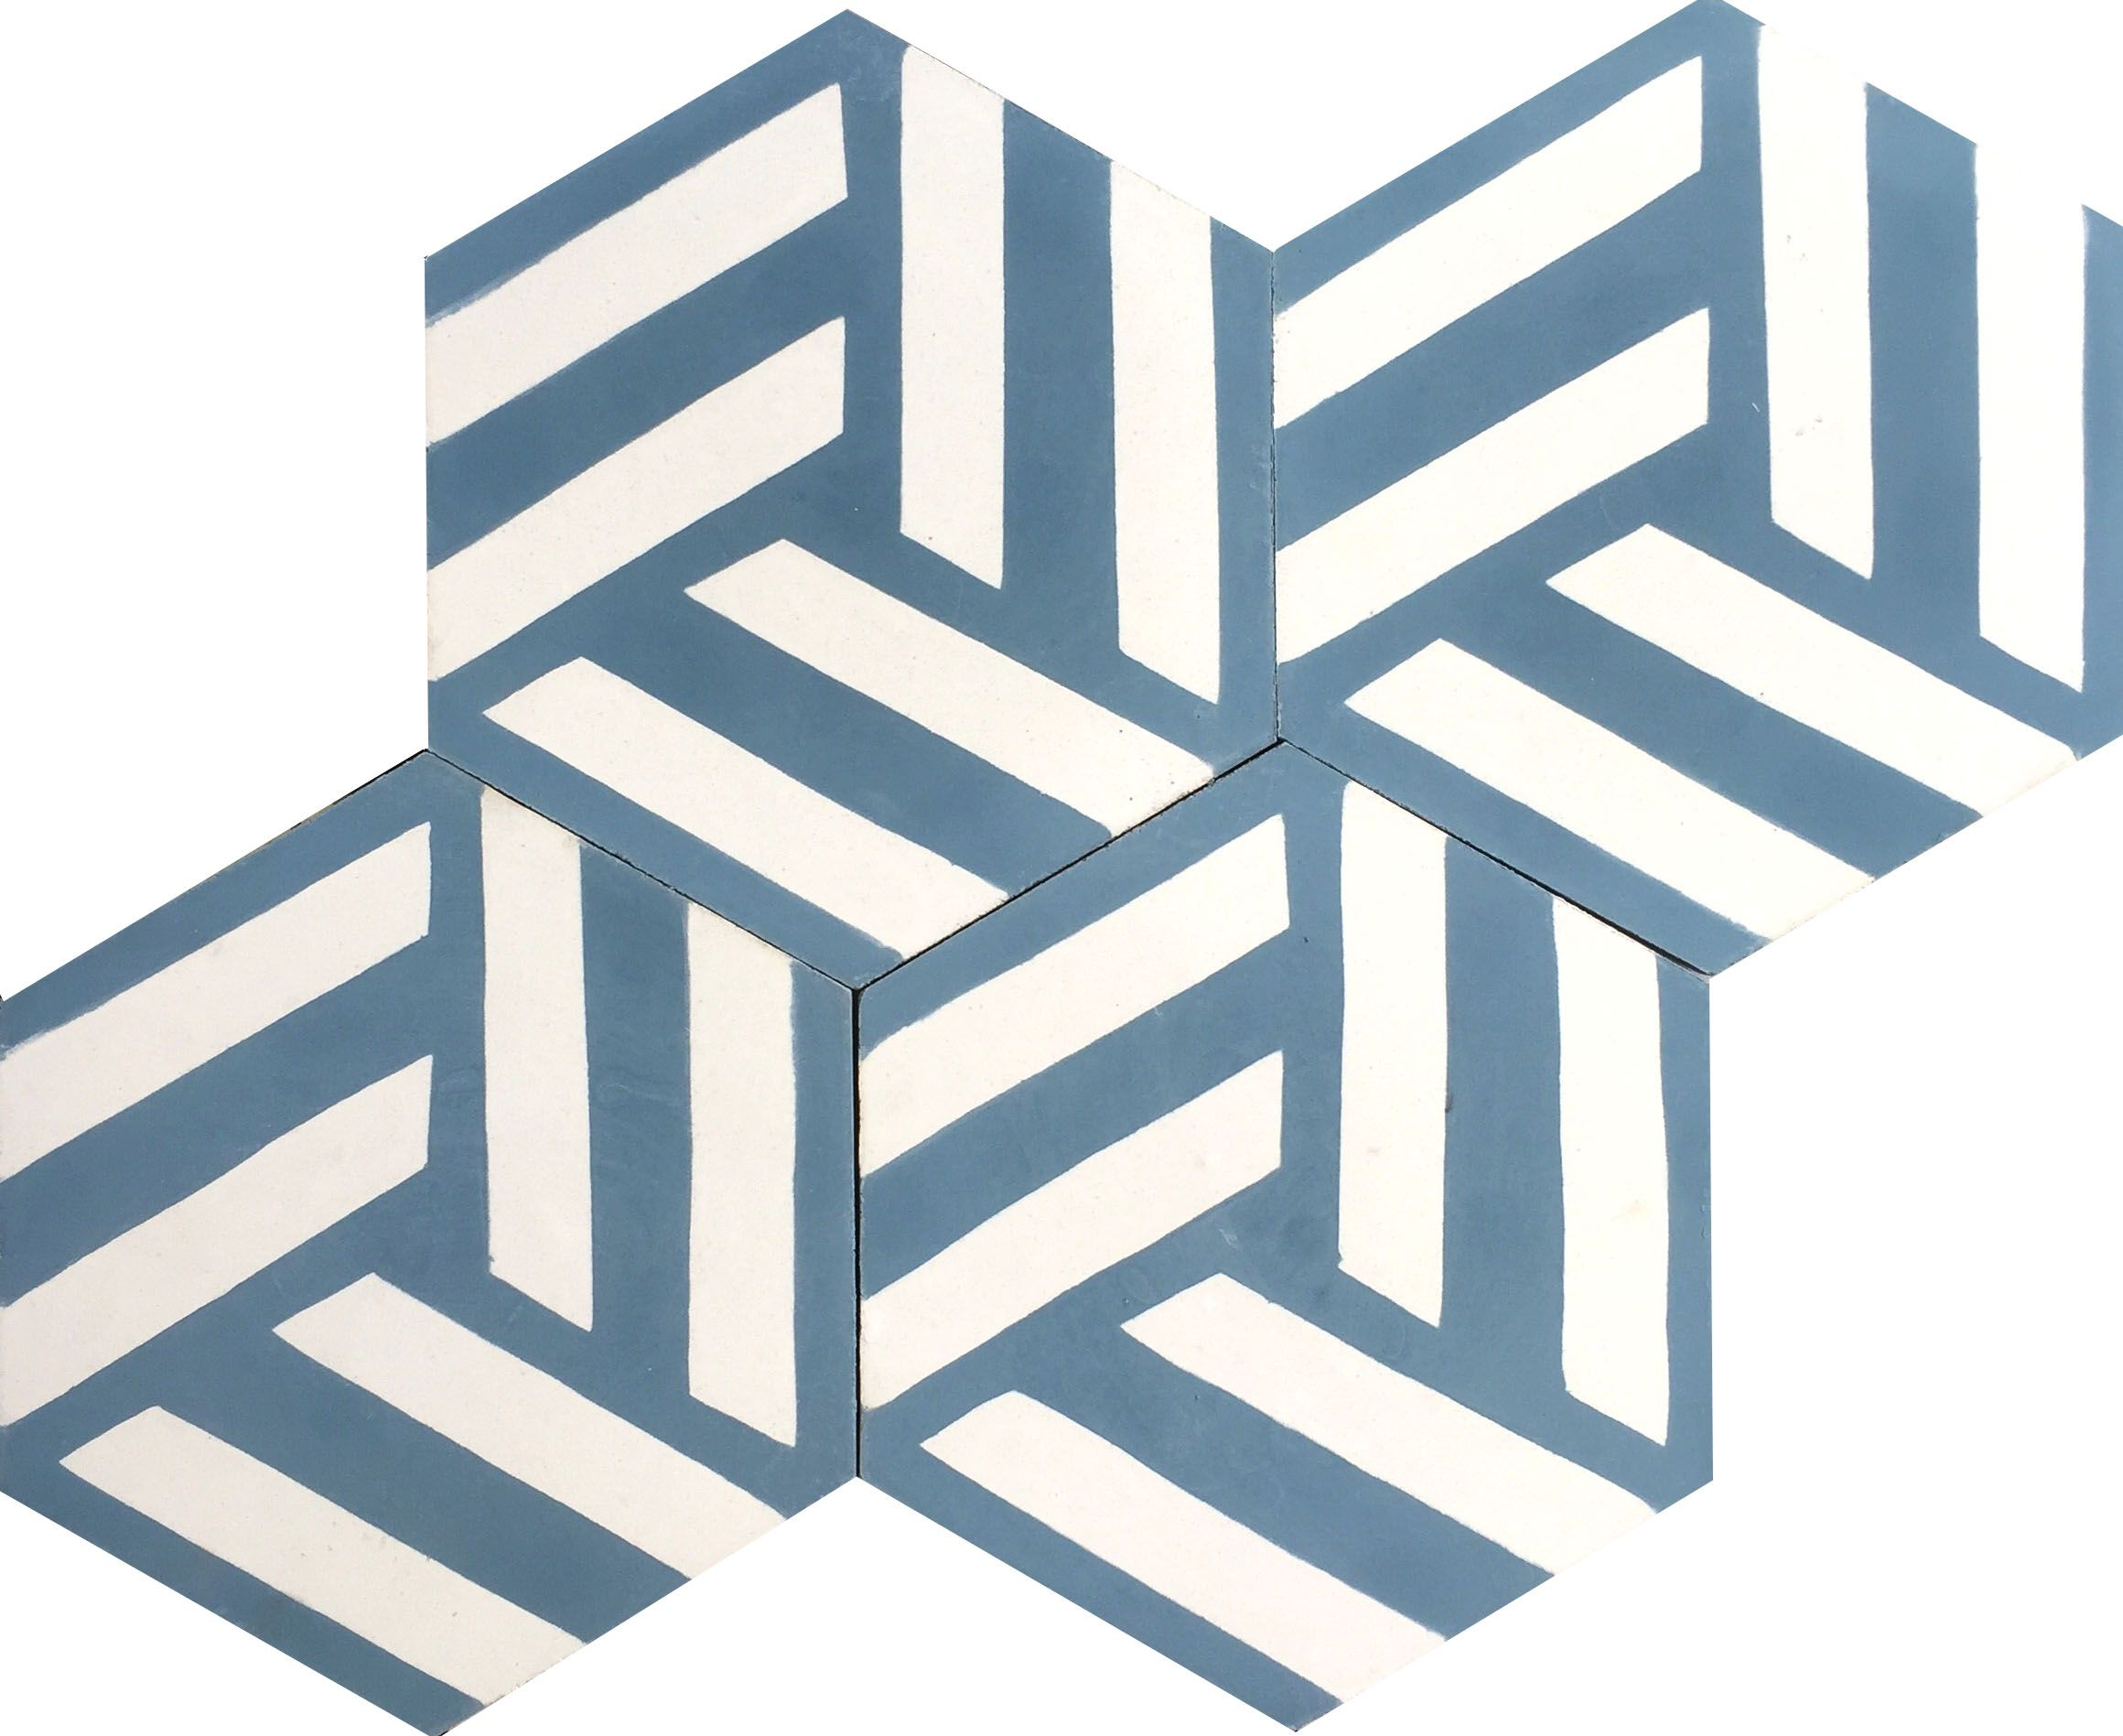 Hexagonal Nudo Encaustic Cement Tiles